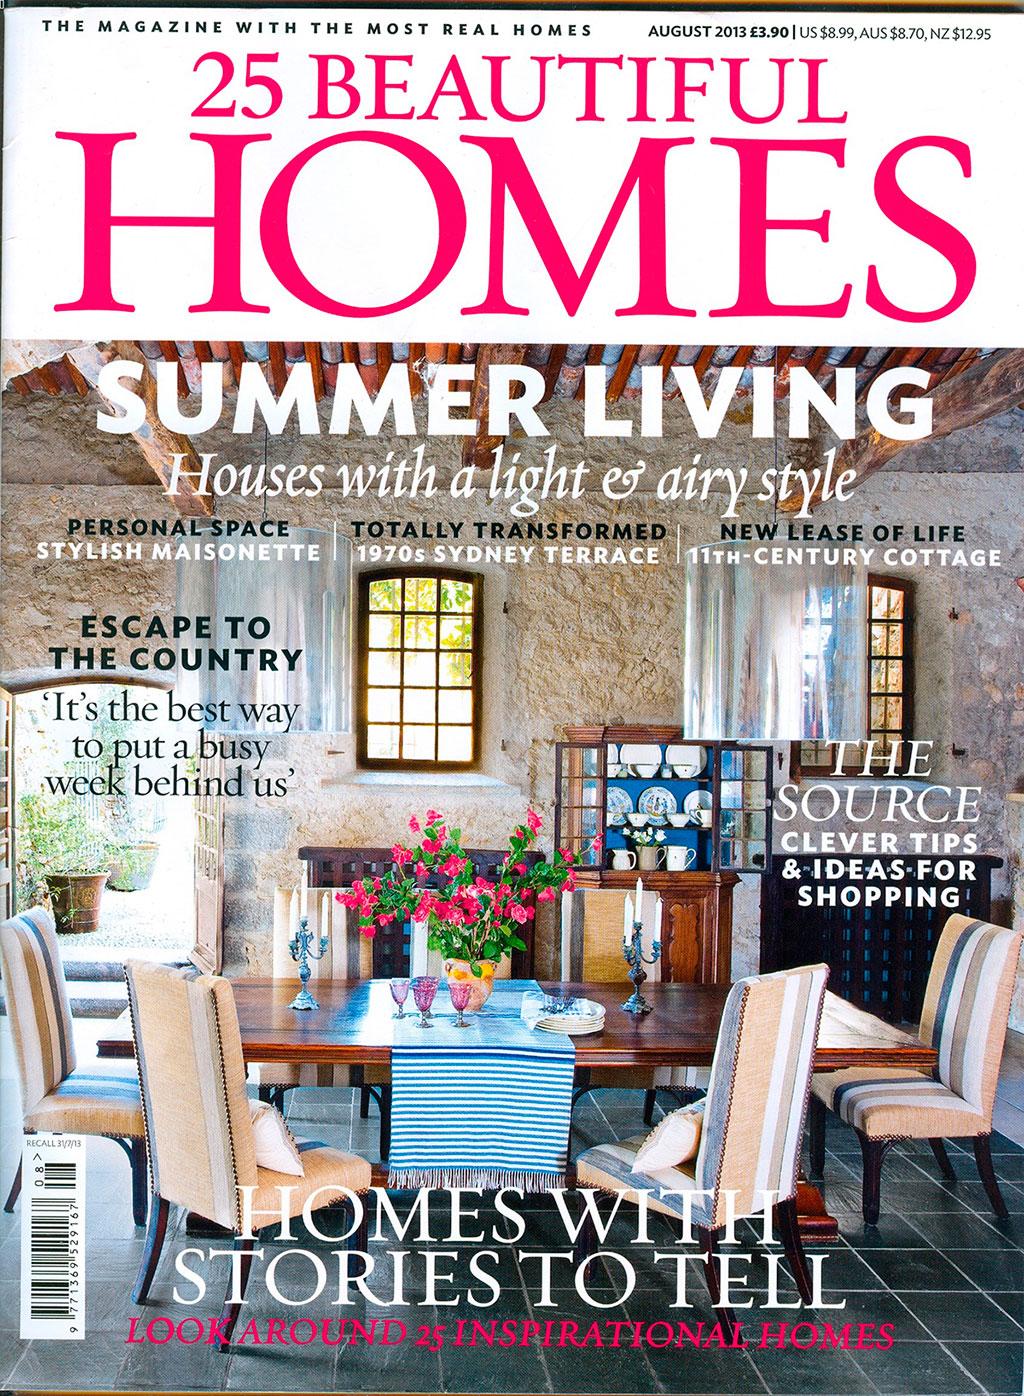 Cezign press 25 beautiful homes Beautiful homes com